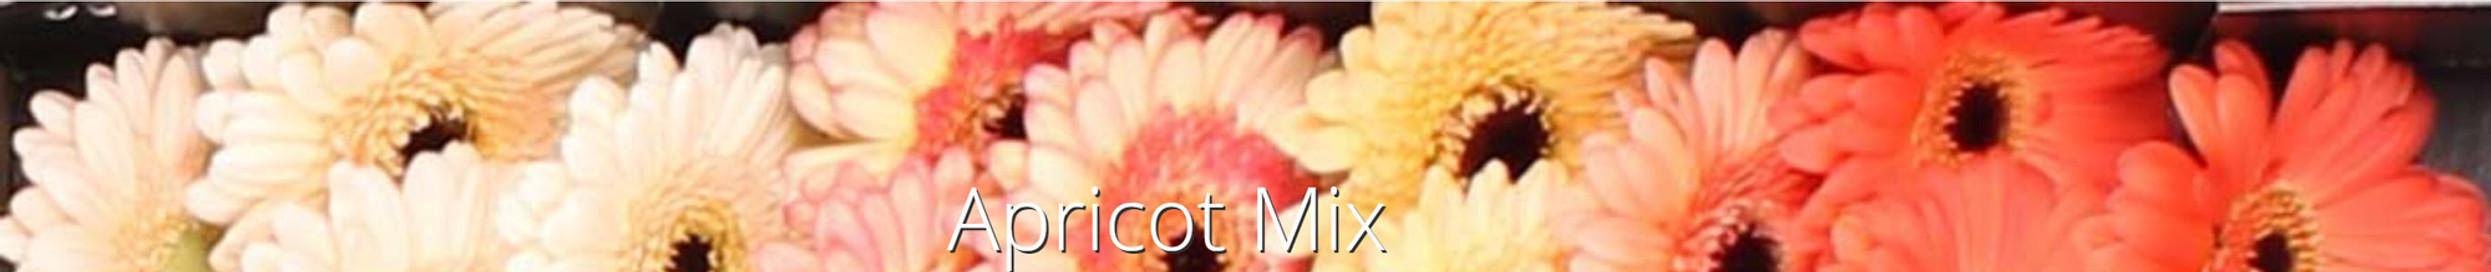 apricot mix.jpg